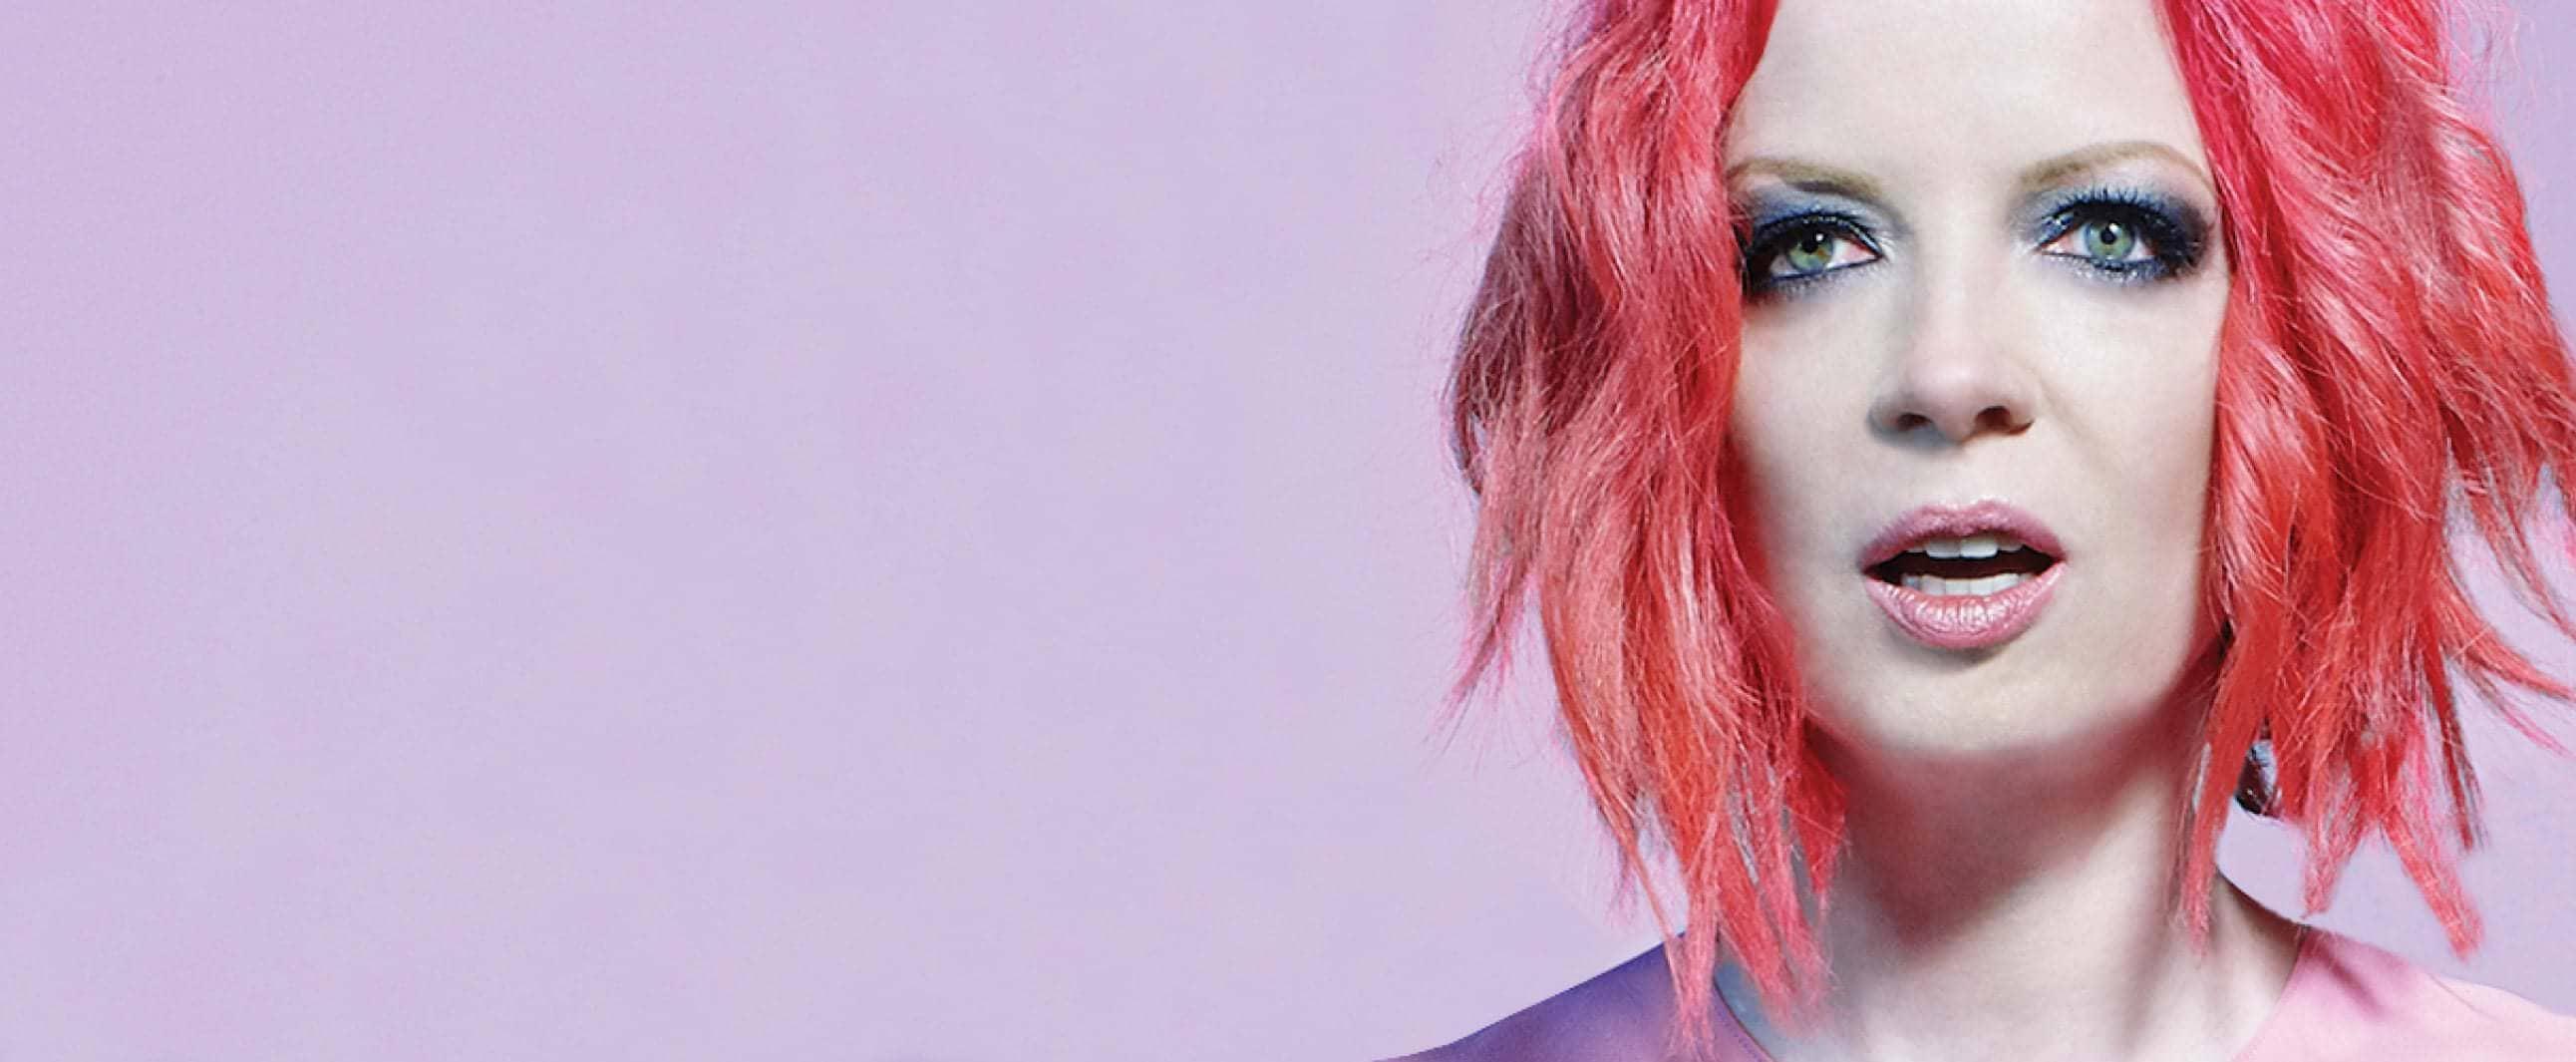 ¡Feliz cumple, Shirley Manson! - Radio Cantilo